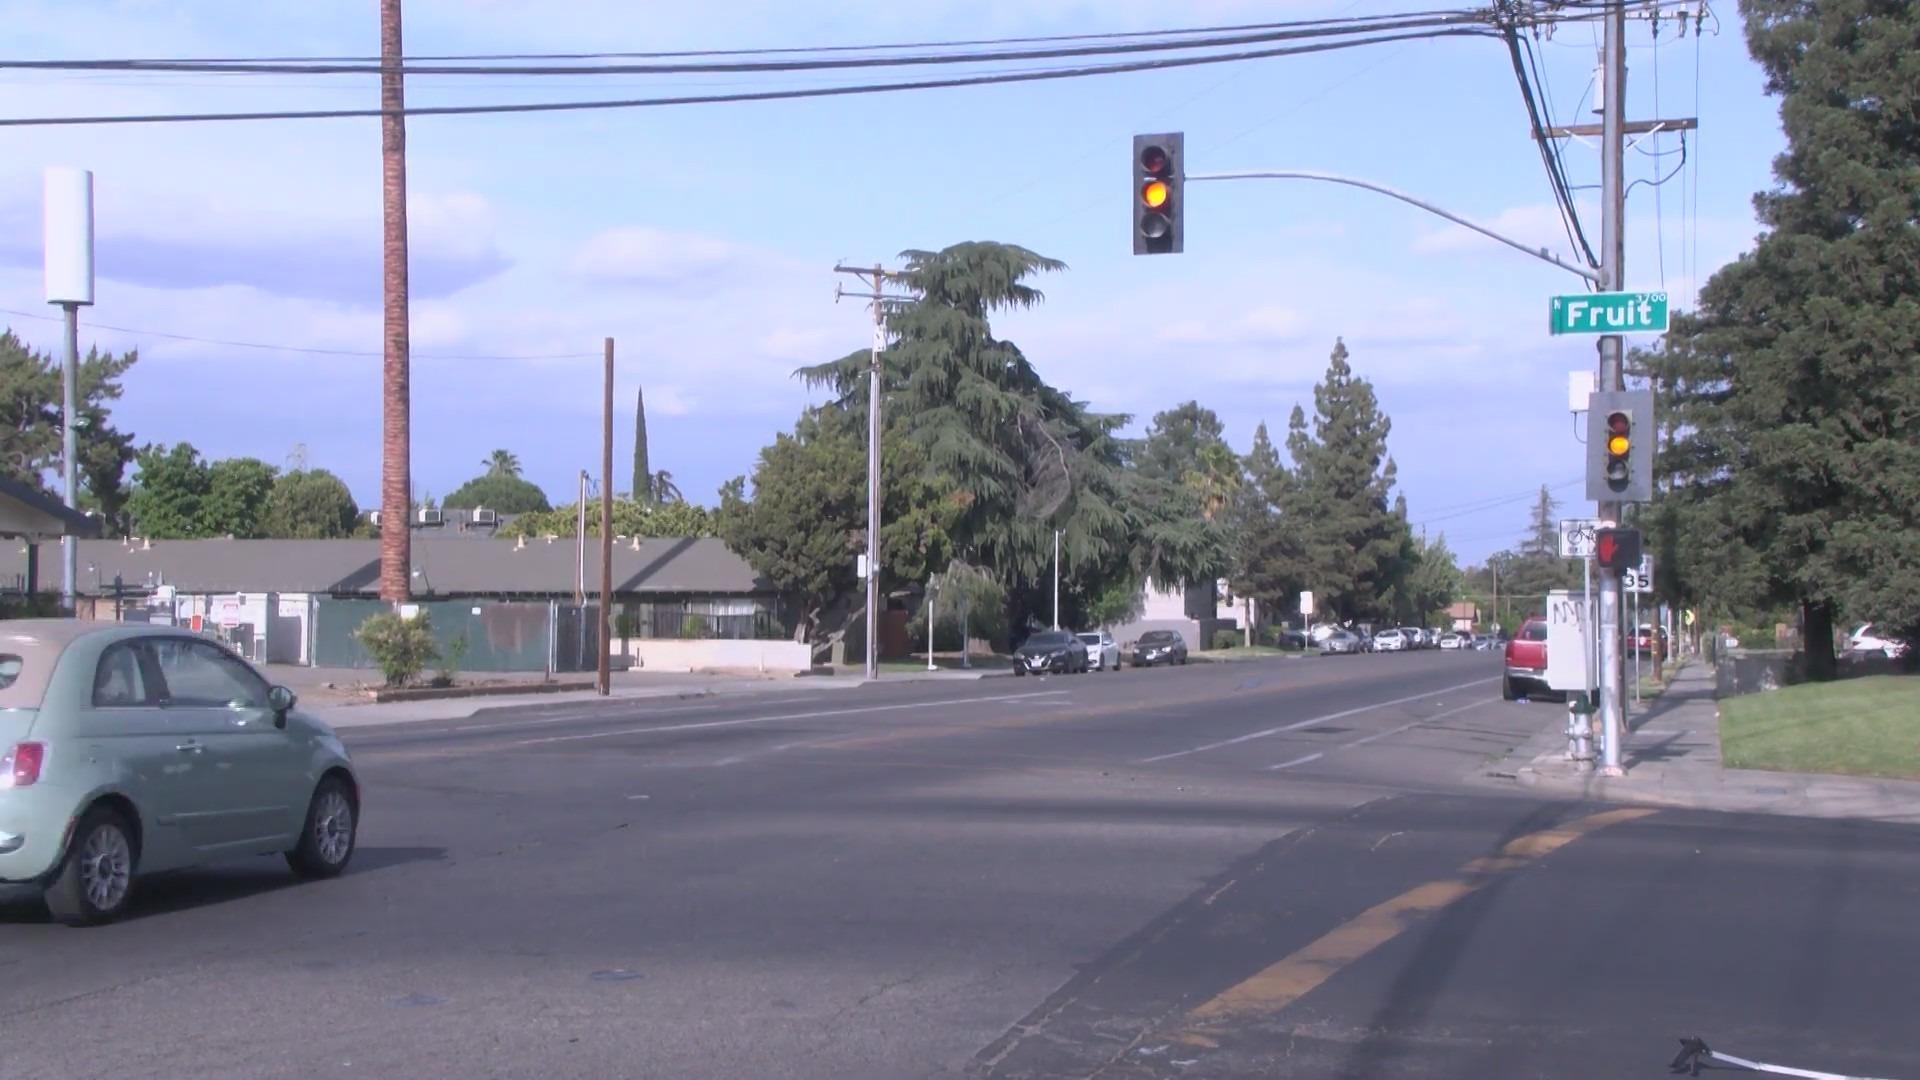 Man killed while running across Fresno street identified by coroner